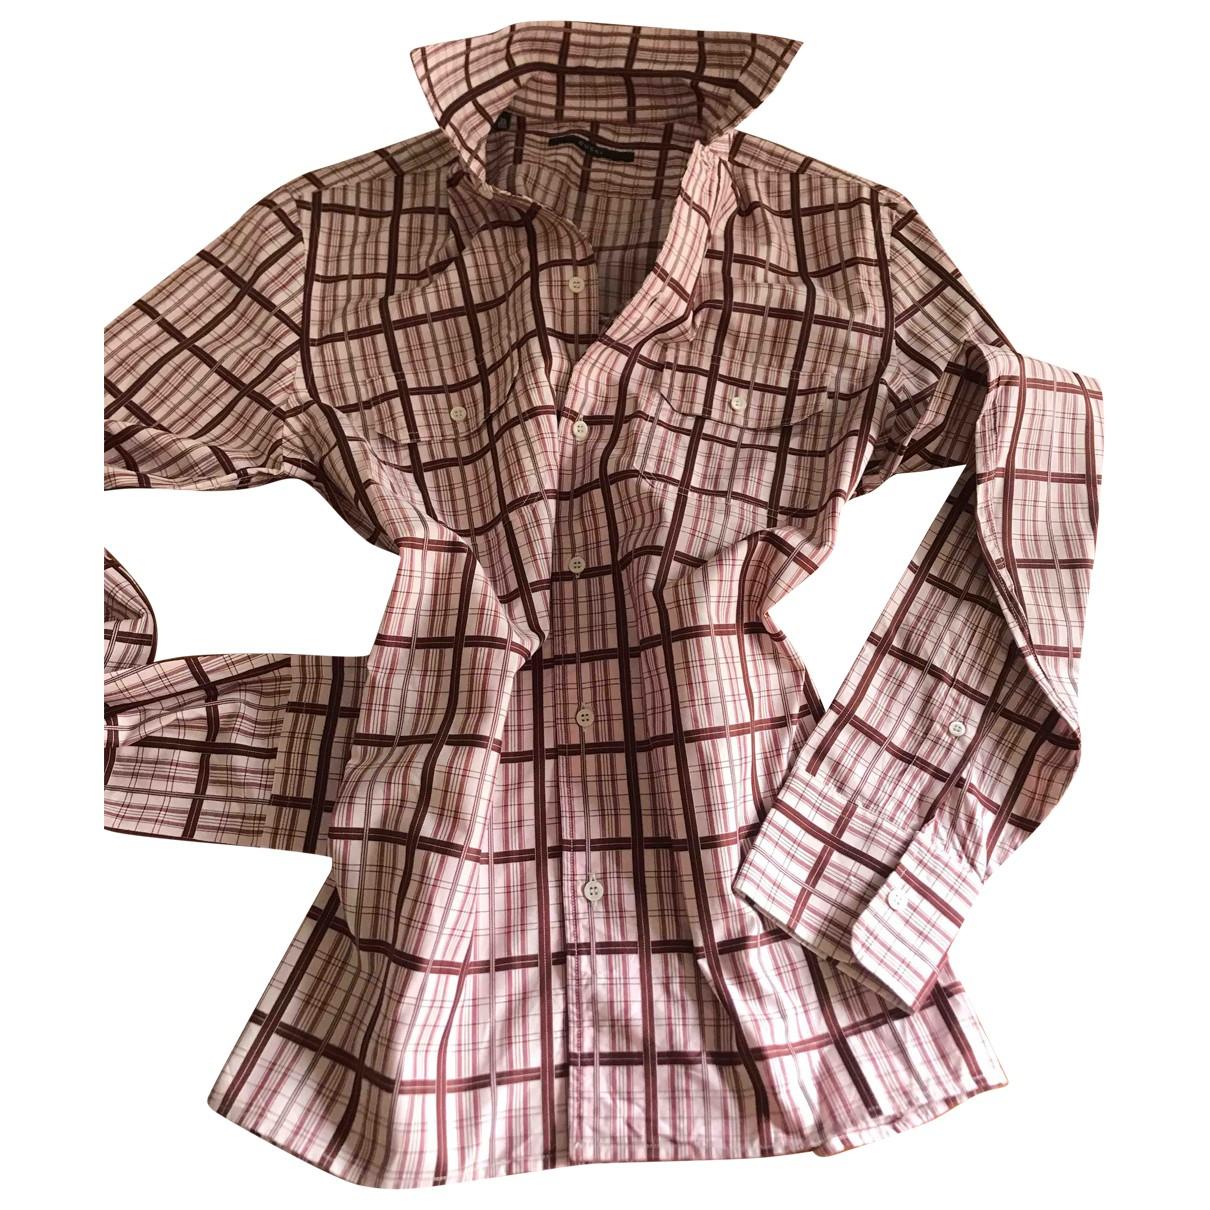 Gucci \N Burgundy Cotton Shirts for Men 39 EU (tour de cou / collar)